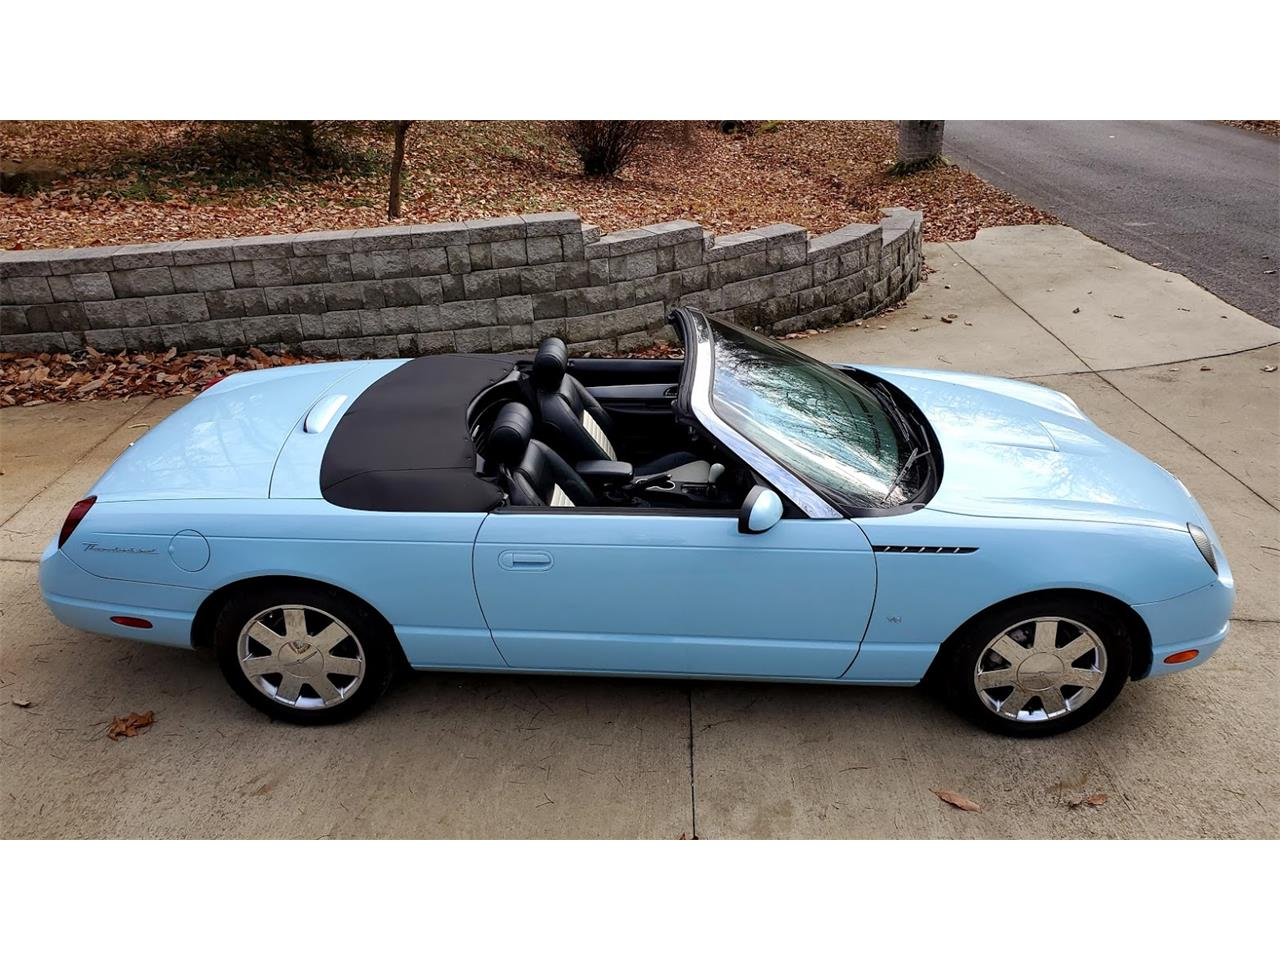 2003 Ford Thunderbird (CC-1298990) for sale in Gurley, Alabama